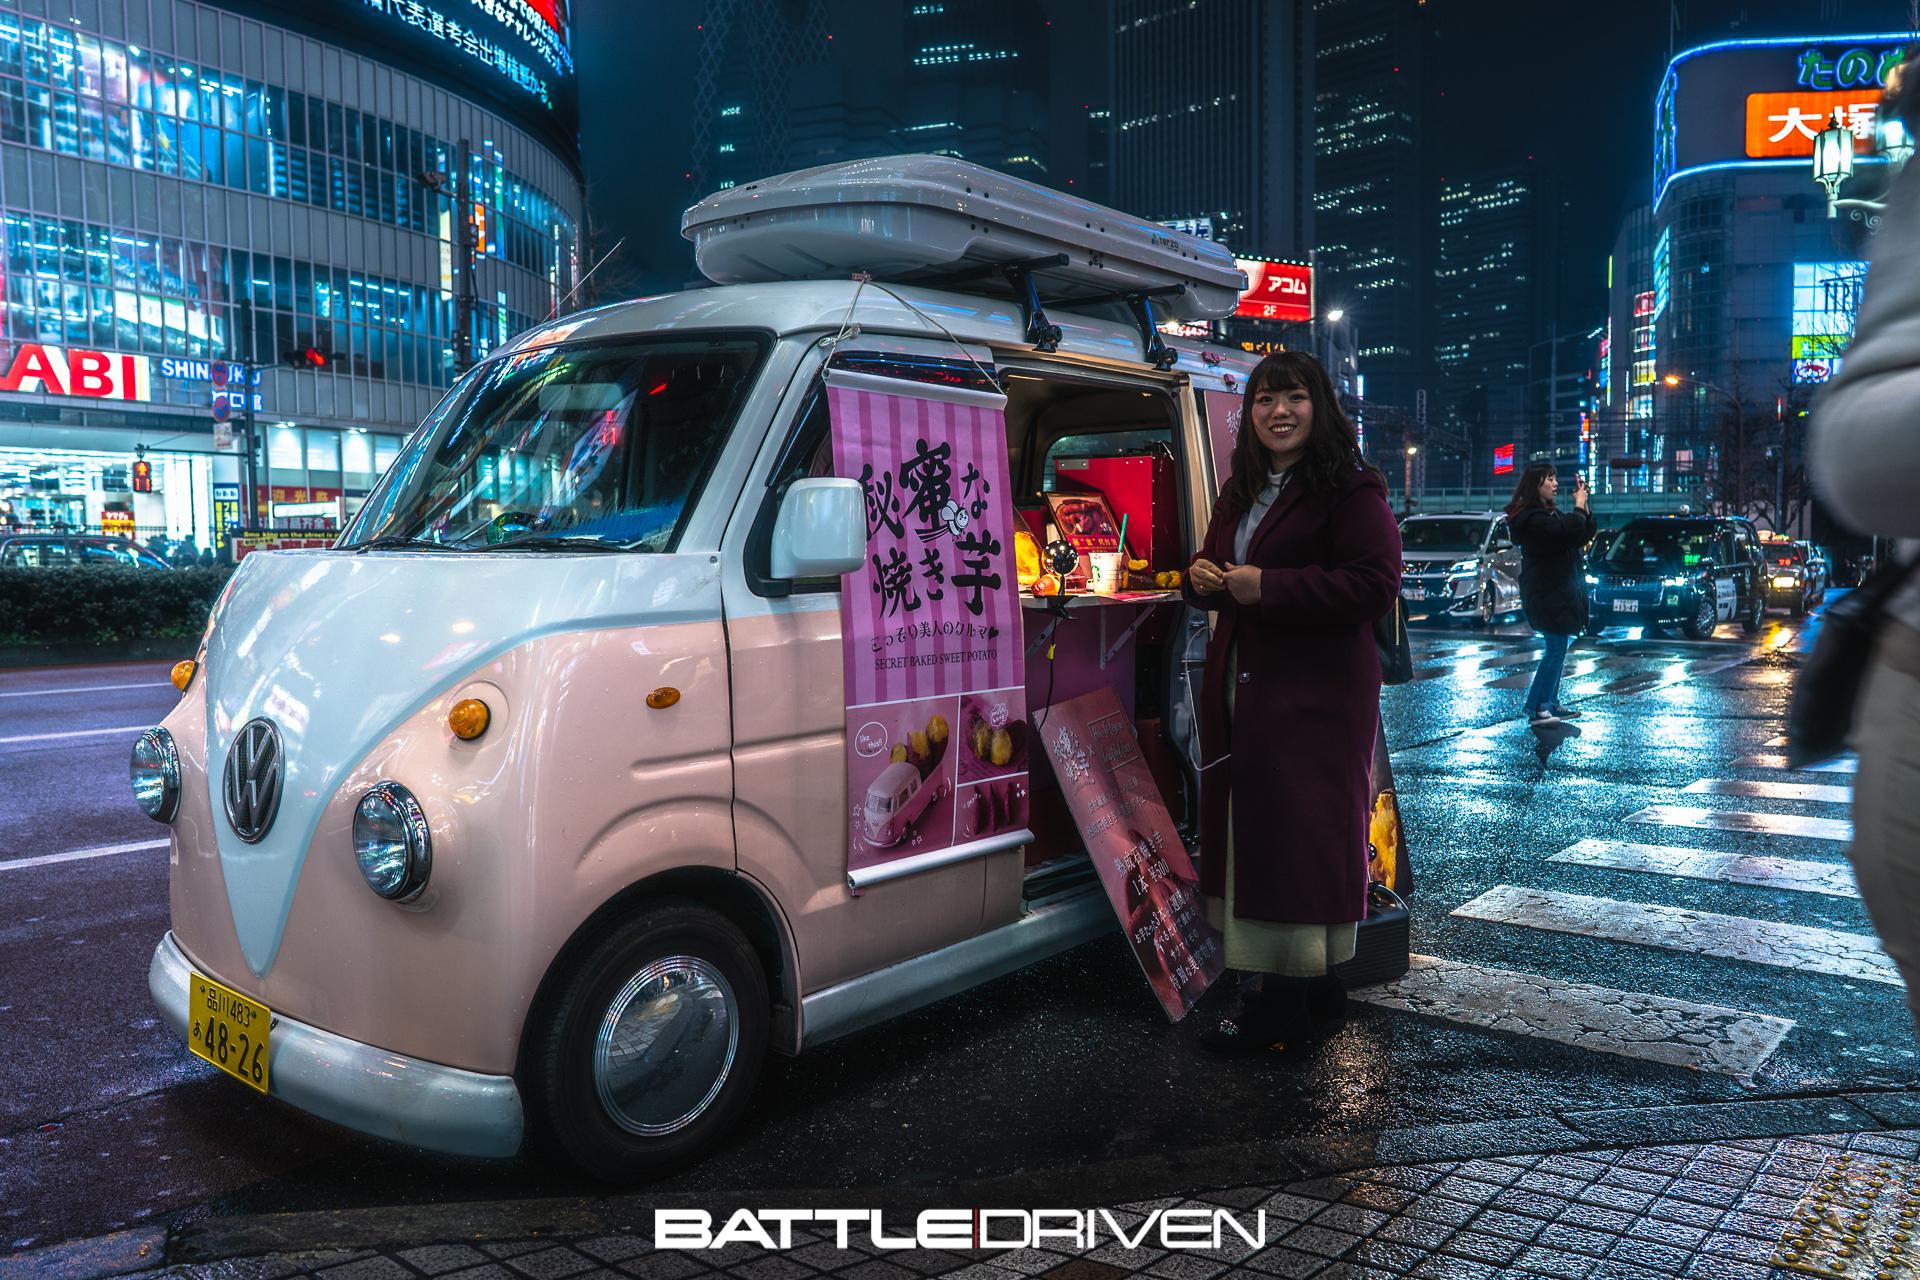 Random sweet potatoes street vendor in Shinjuku to end this small coverage.